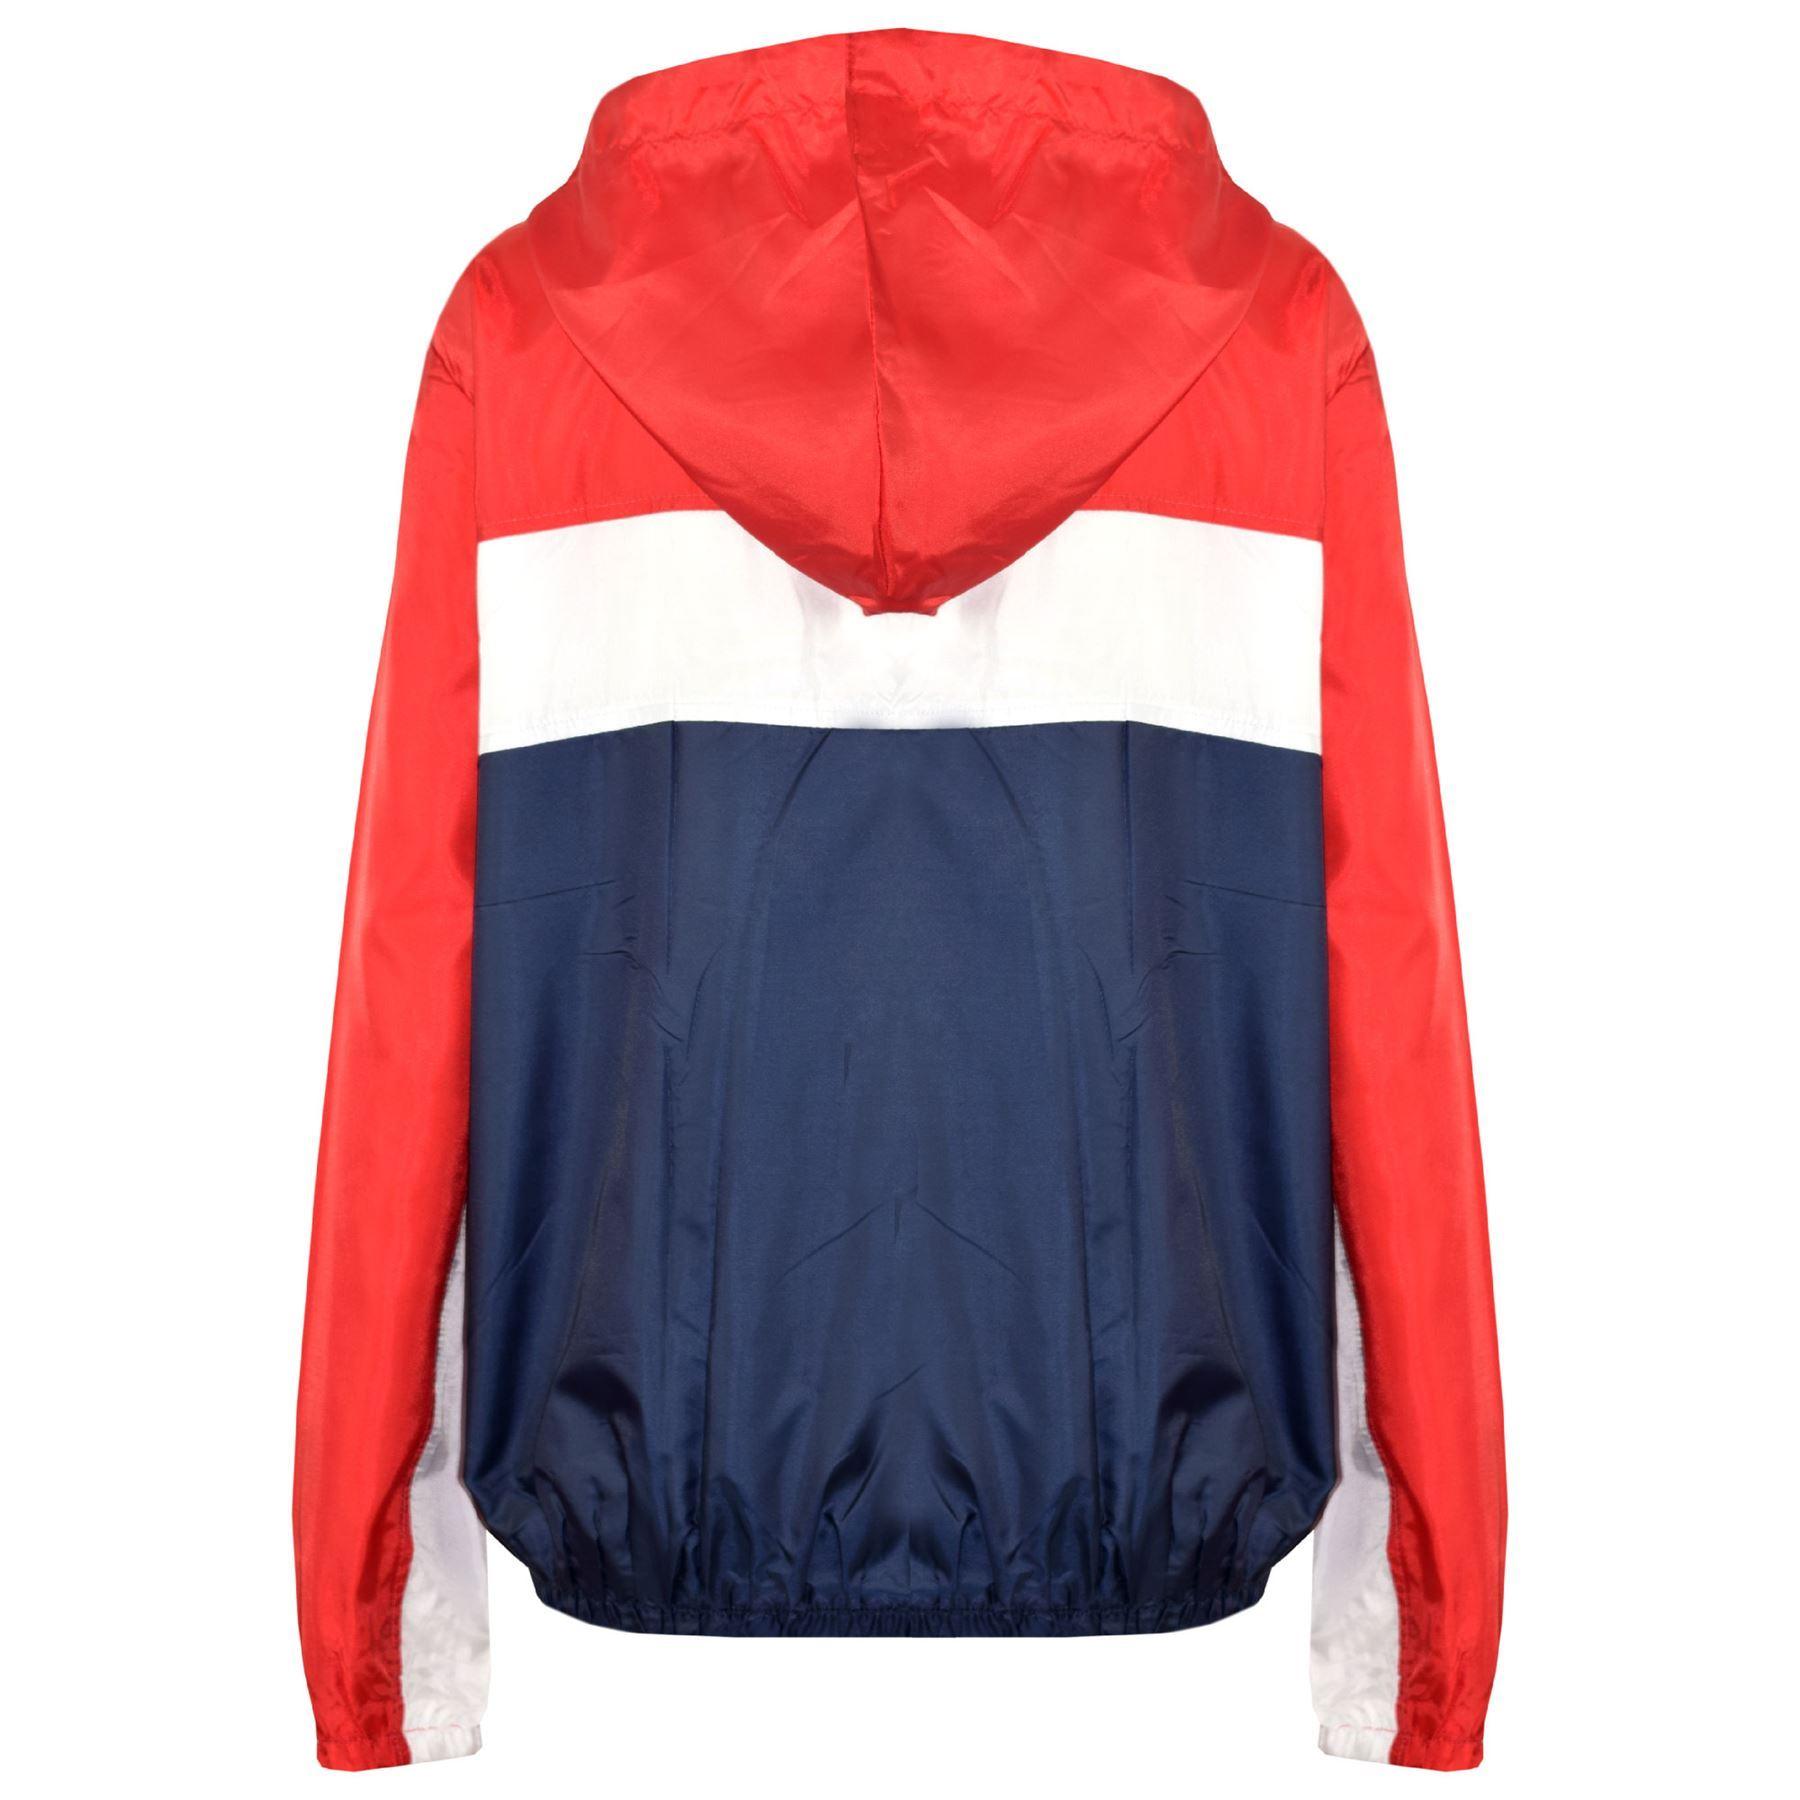 Kids-Boys-Girls-Windbreaker-Contrast-Block-Hooded-Jackets-Rain-Mac-Raincoat-5-13 thumbnail 15